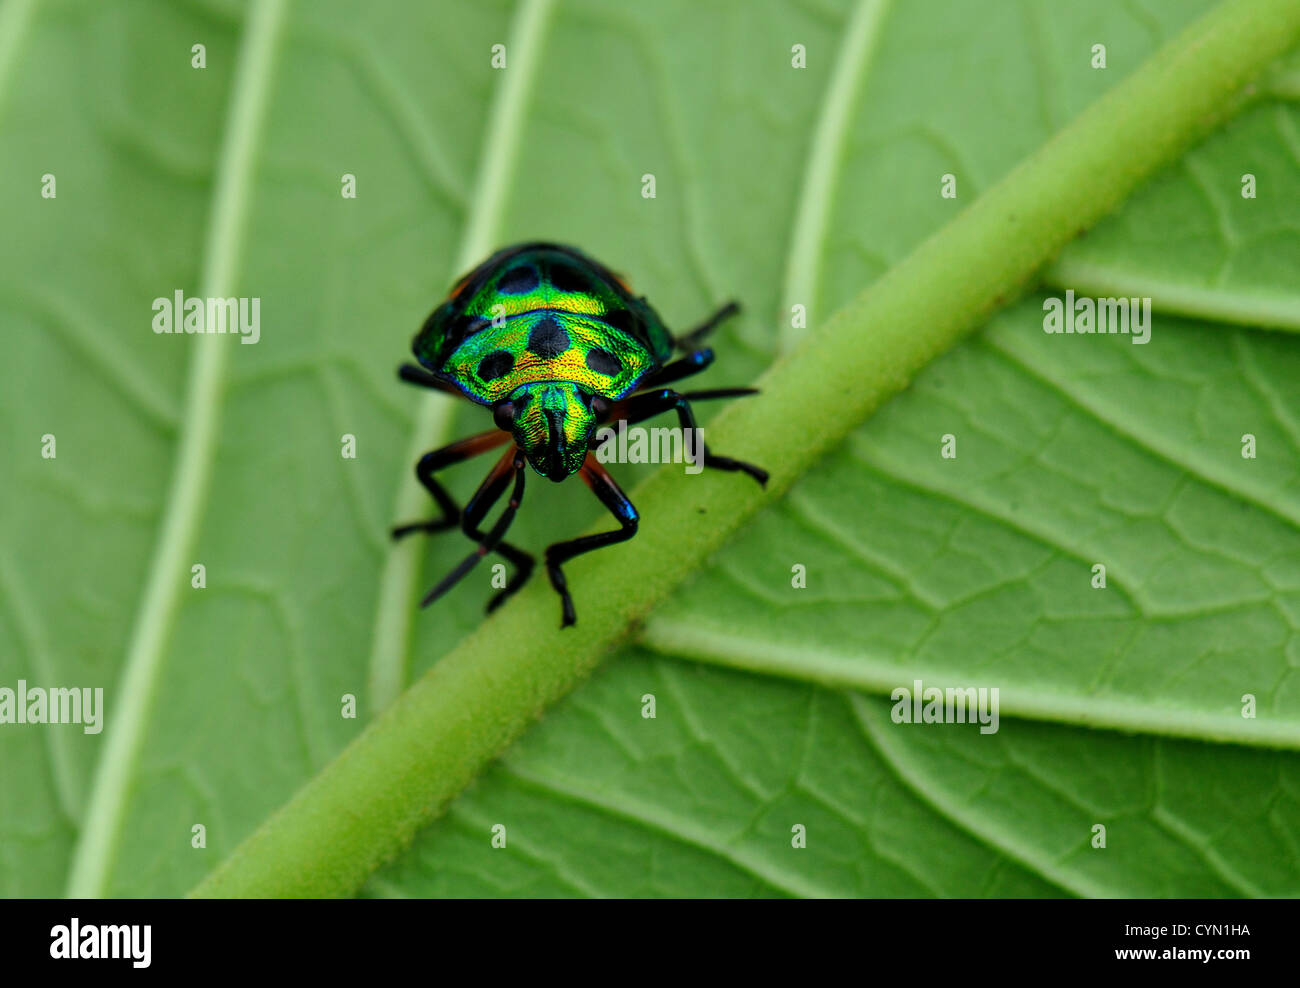 Jewel bug - Stock Image